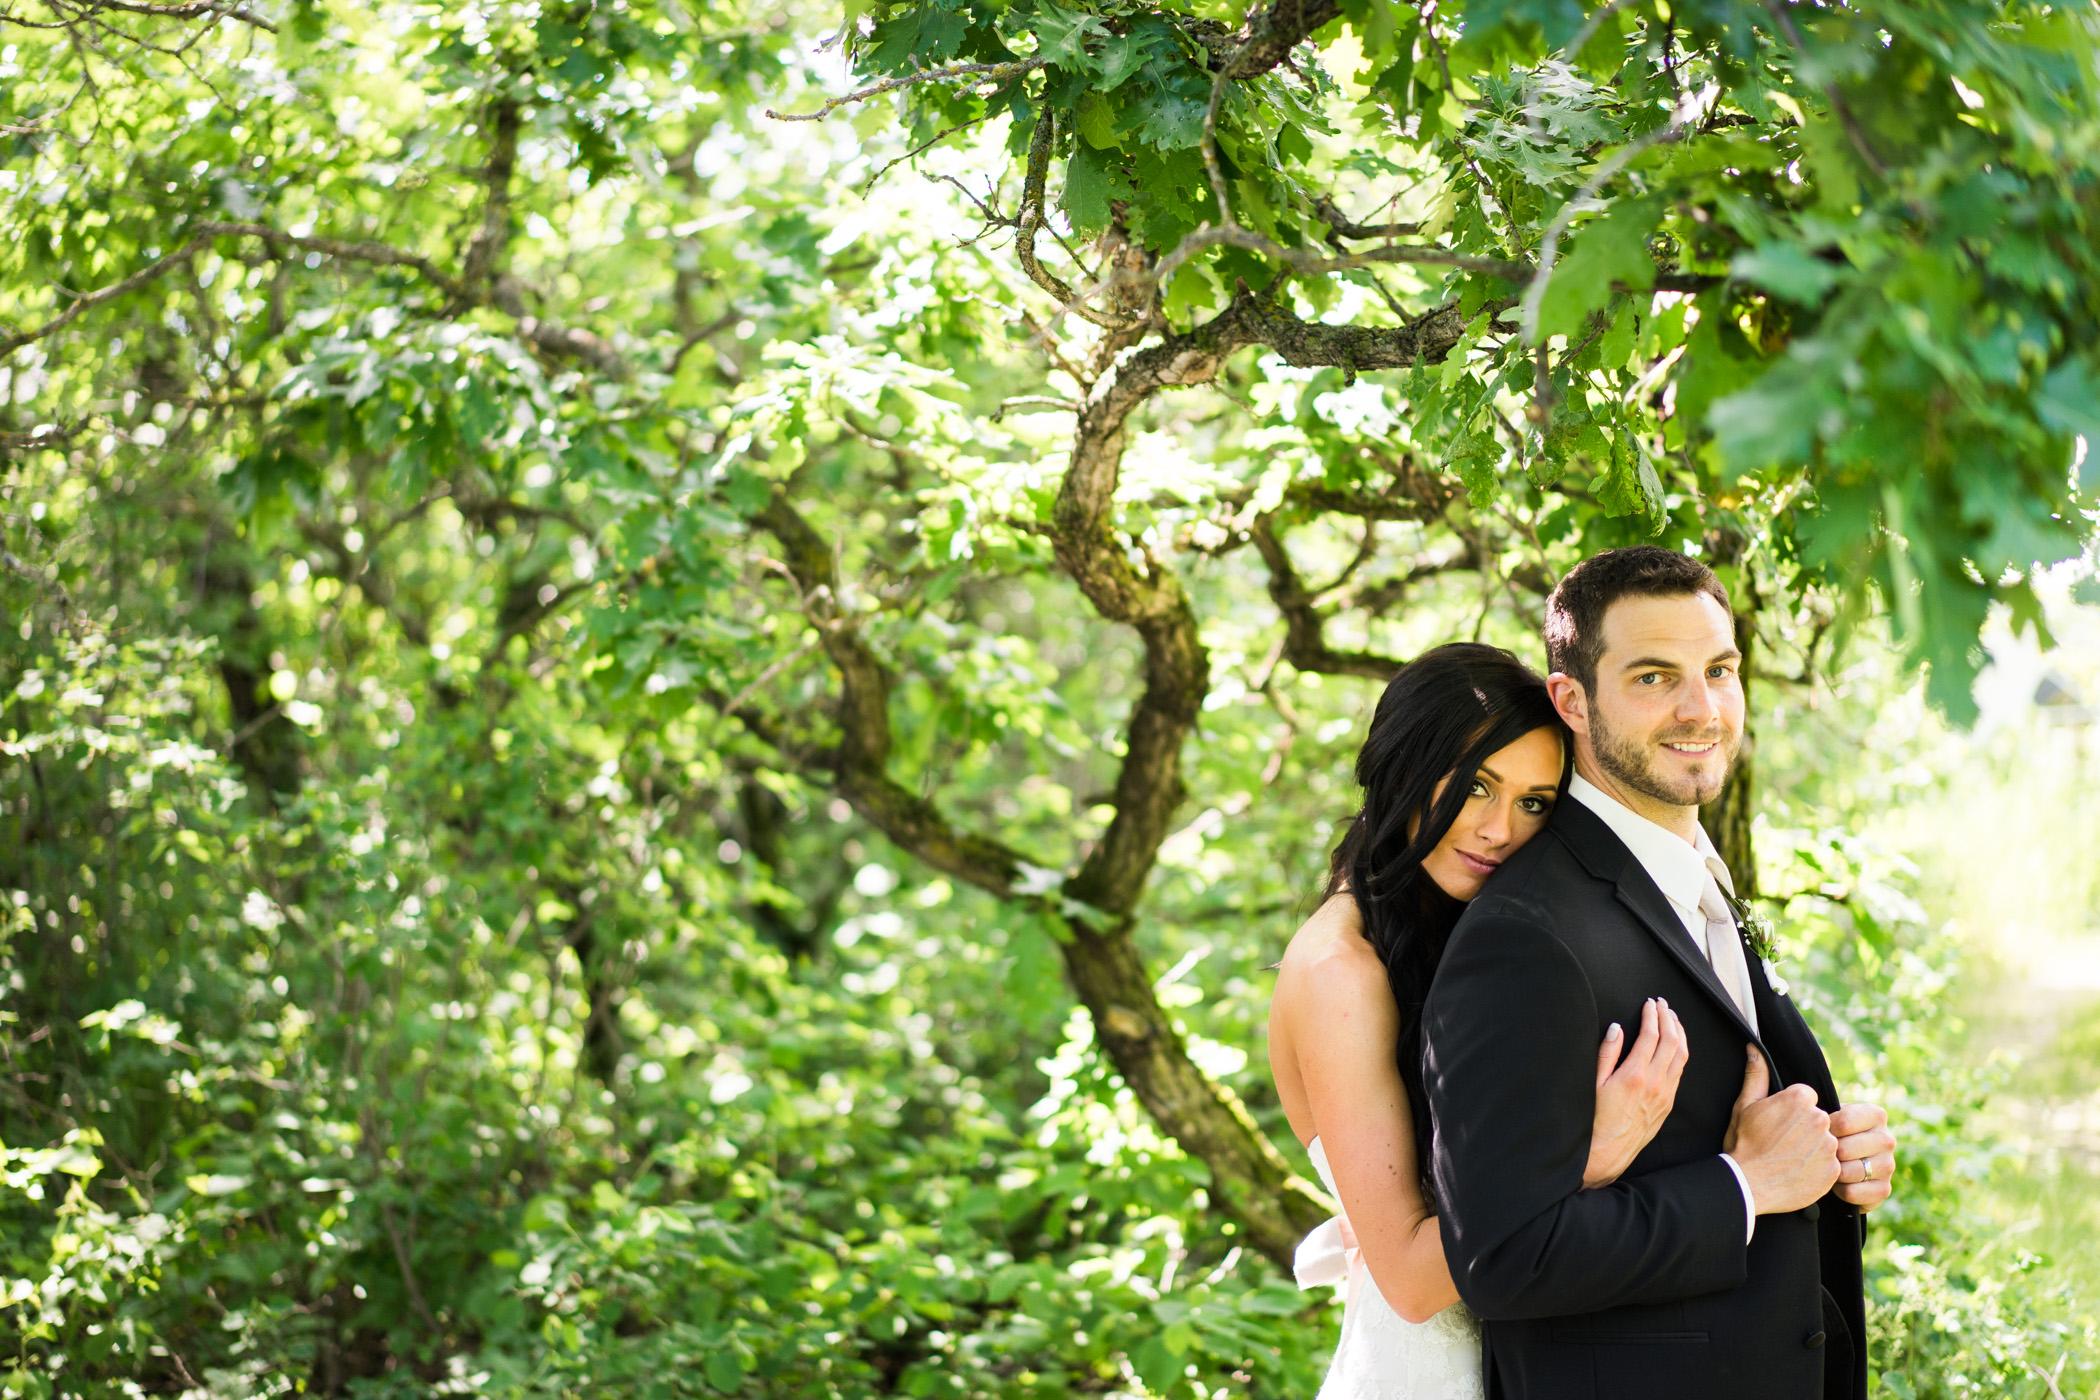 Hillary and Mark - Pineridge Hollow Wedding - Cojo Photo-1270.jpg